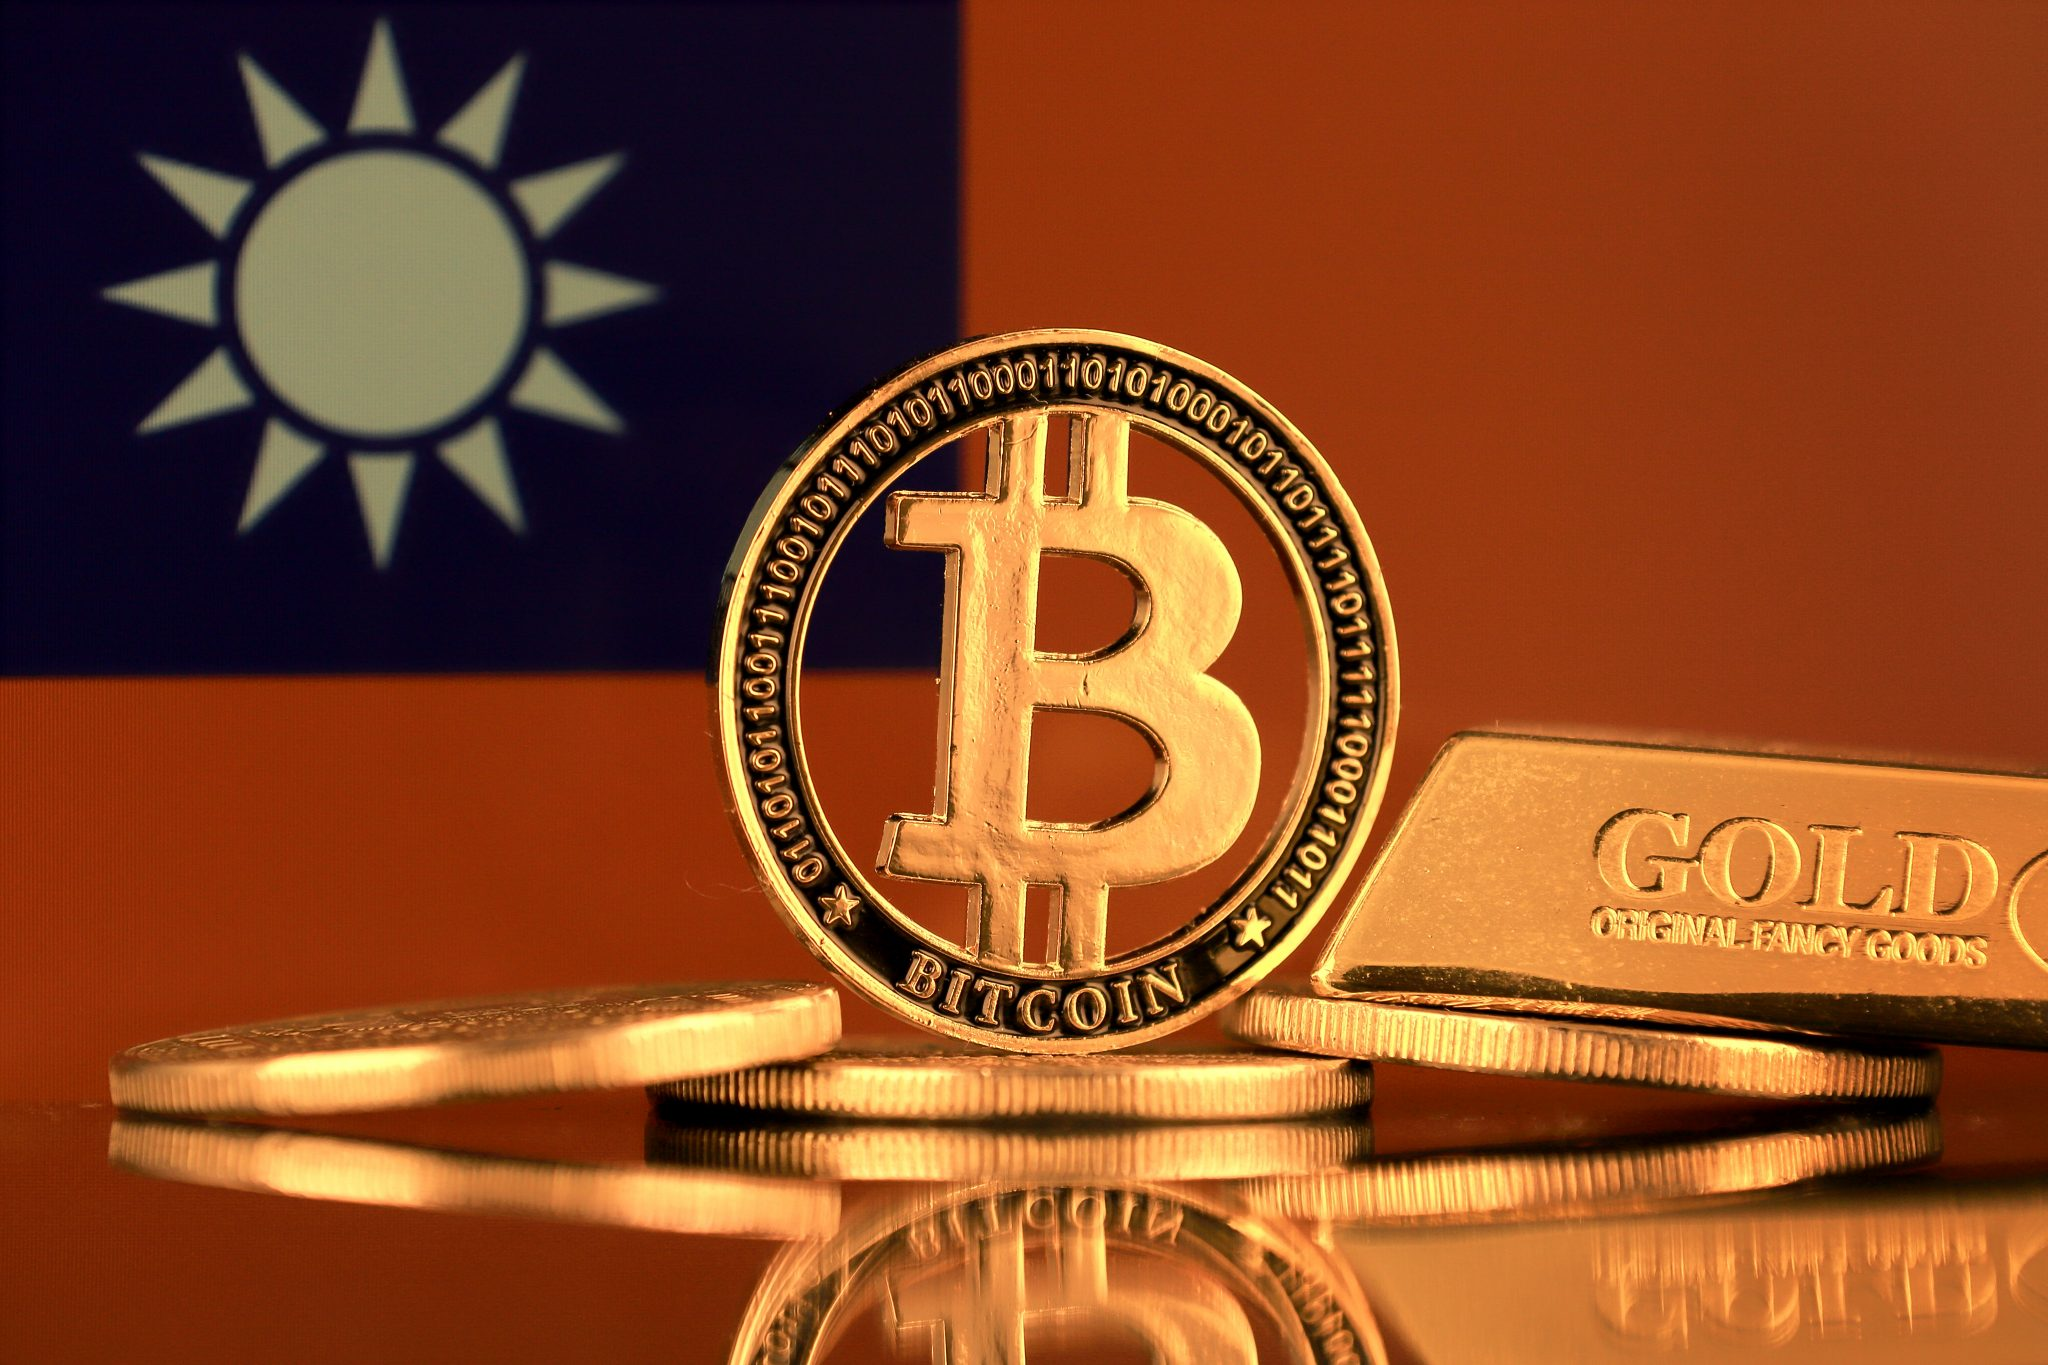 Physical version of Bitcoin, gold bar and Taiwan Flag.